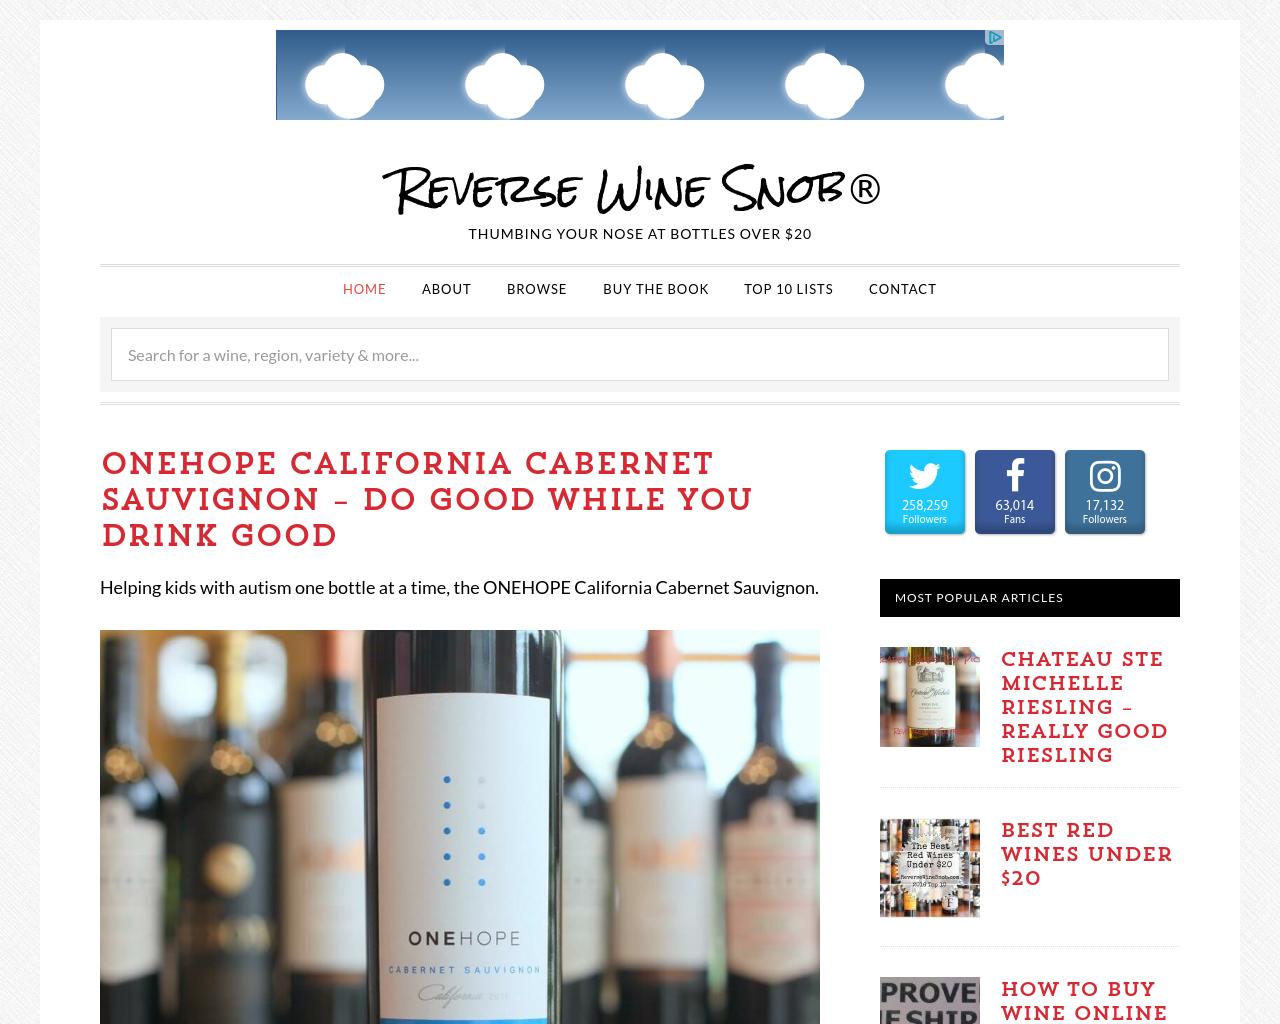 The-Reverse-Wine-Snob-Advertising-Reviews-Pricing